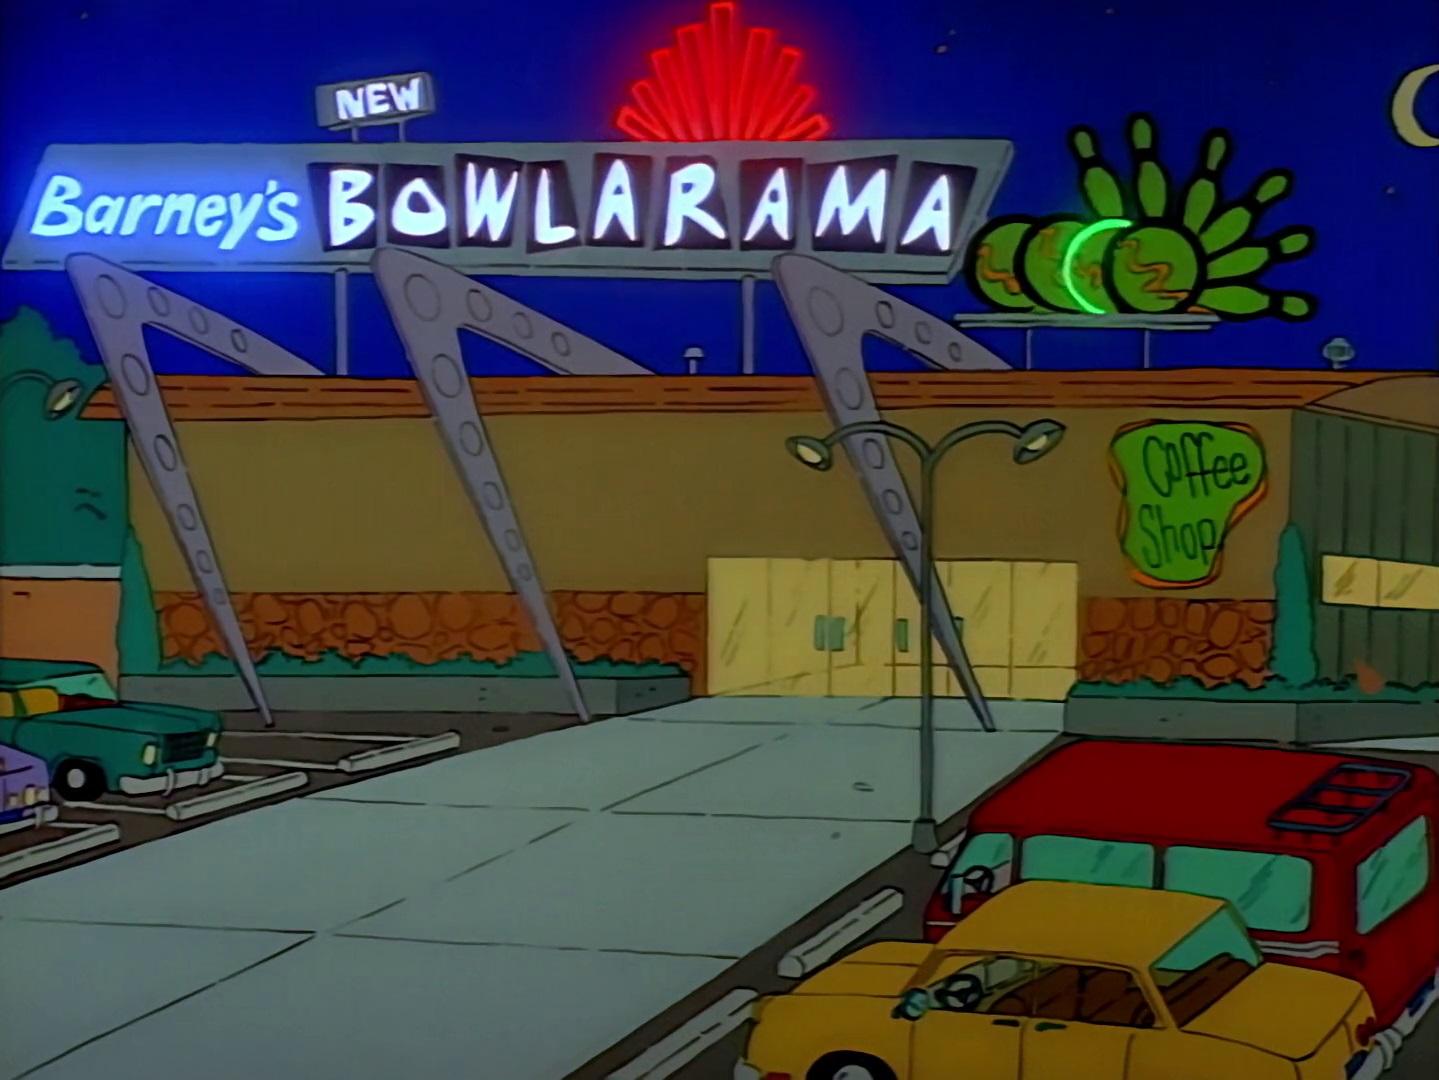 Barney's Bowlarama